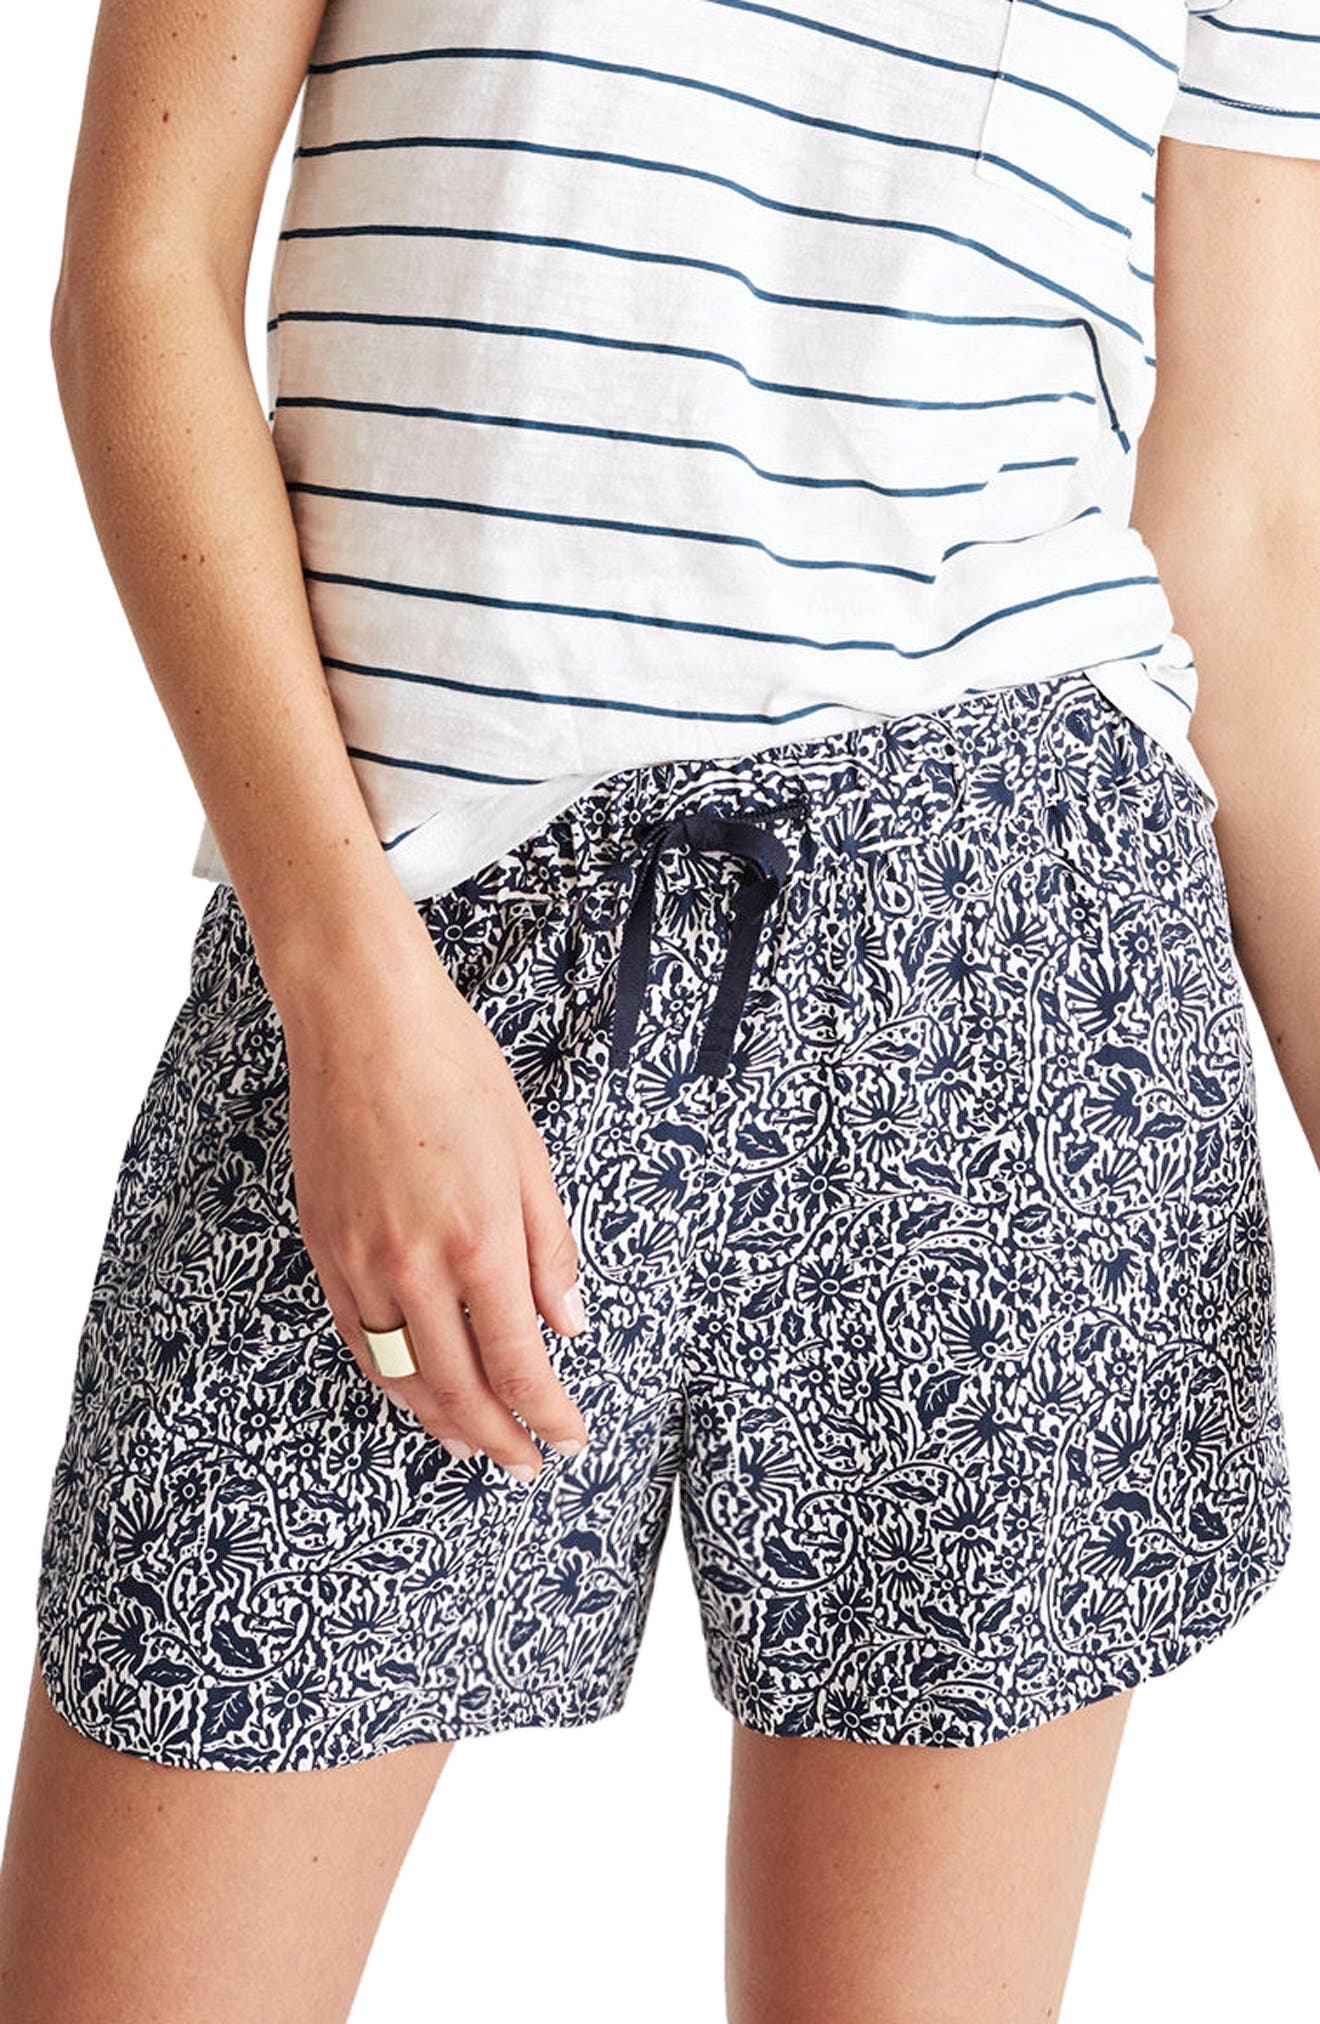 Madewell Print Drapey Pull-On Shorts